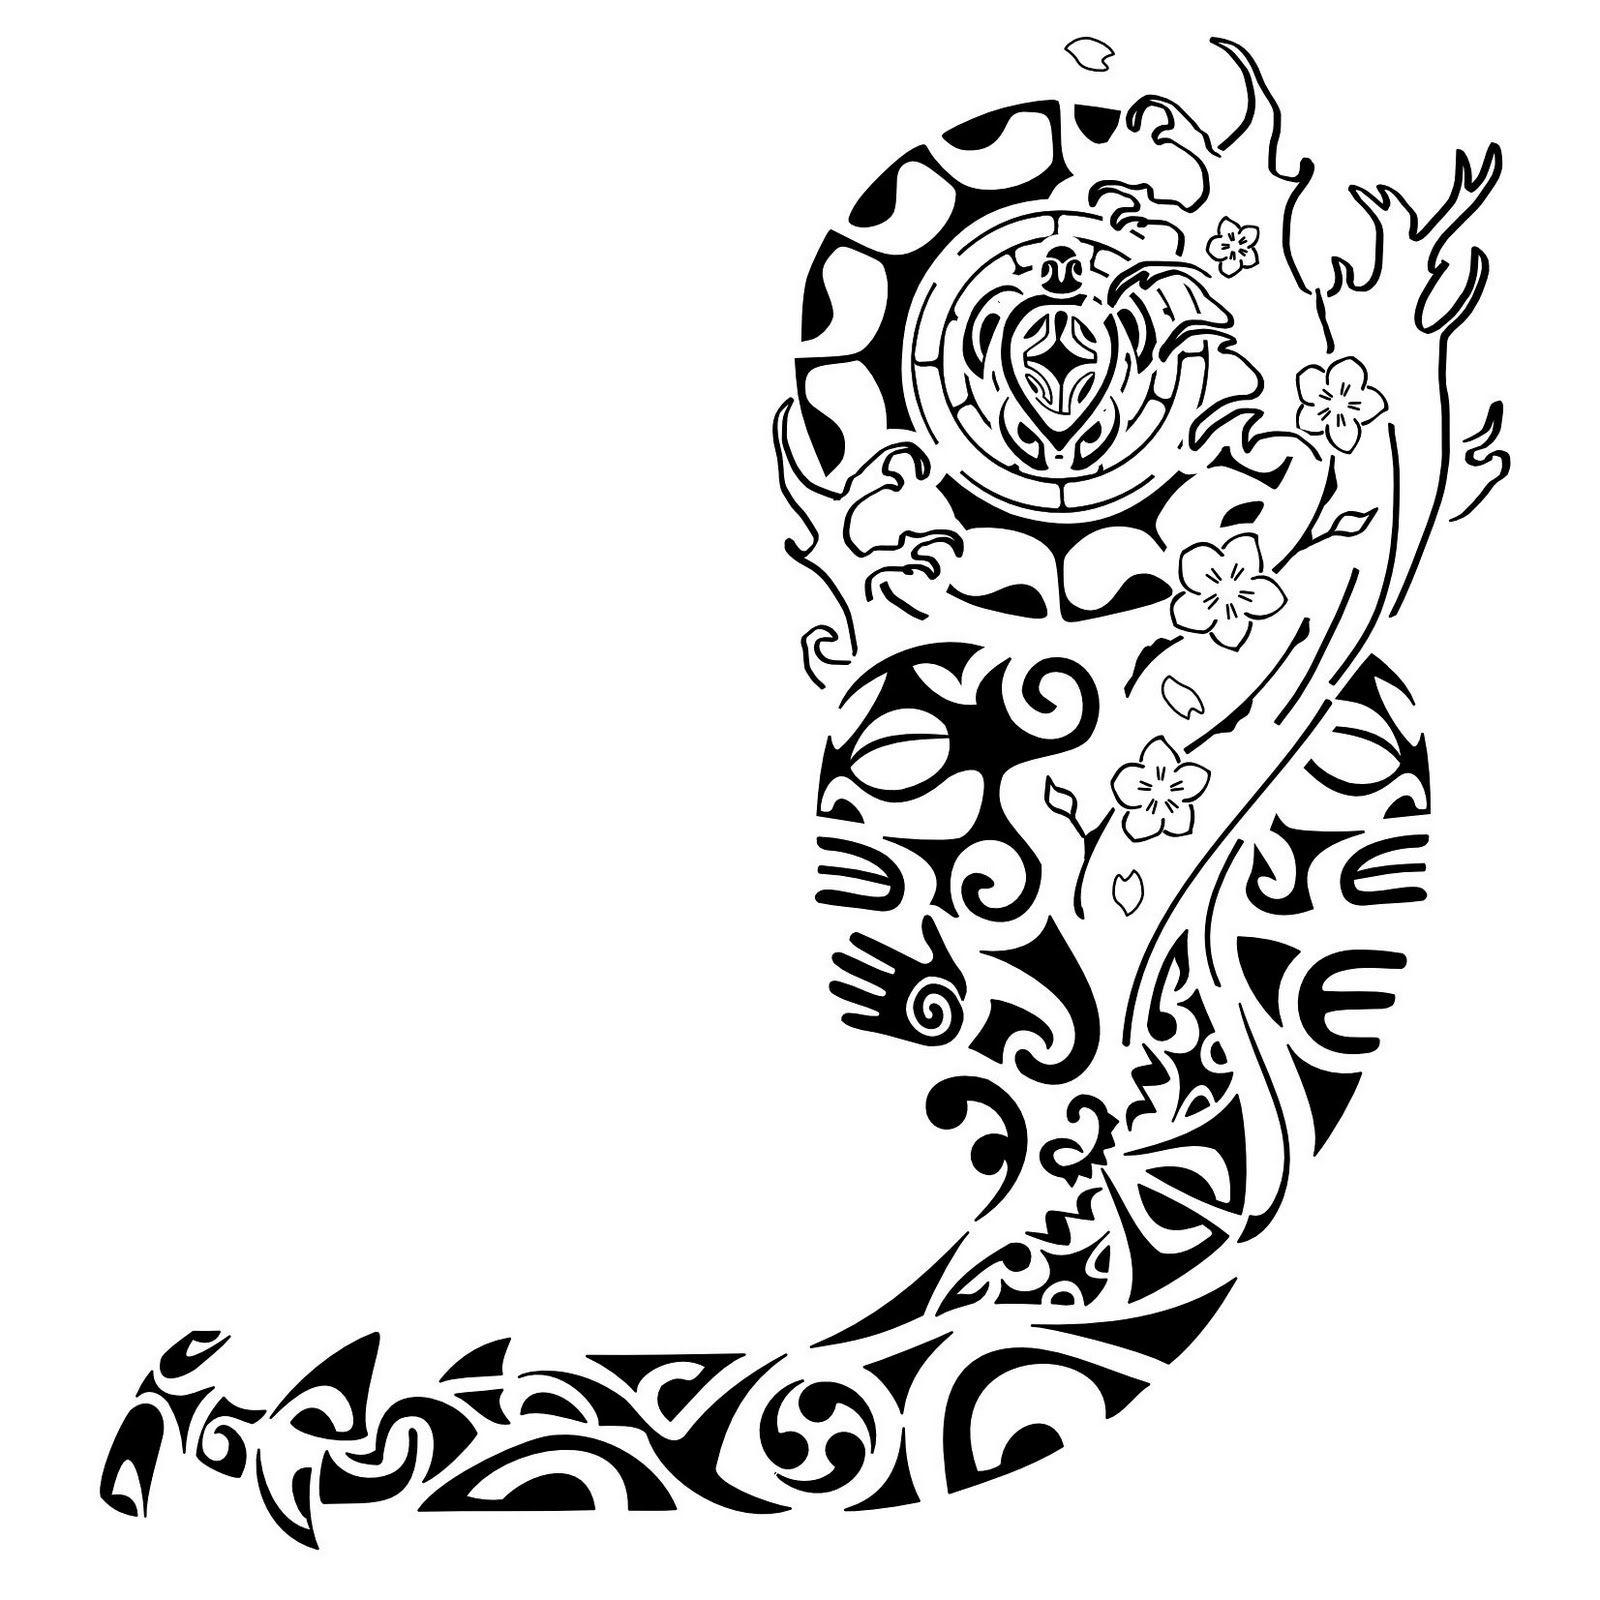 Bluskytattoo Maori Significato 202 Tiki Tatuaggio Samoano